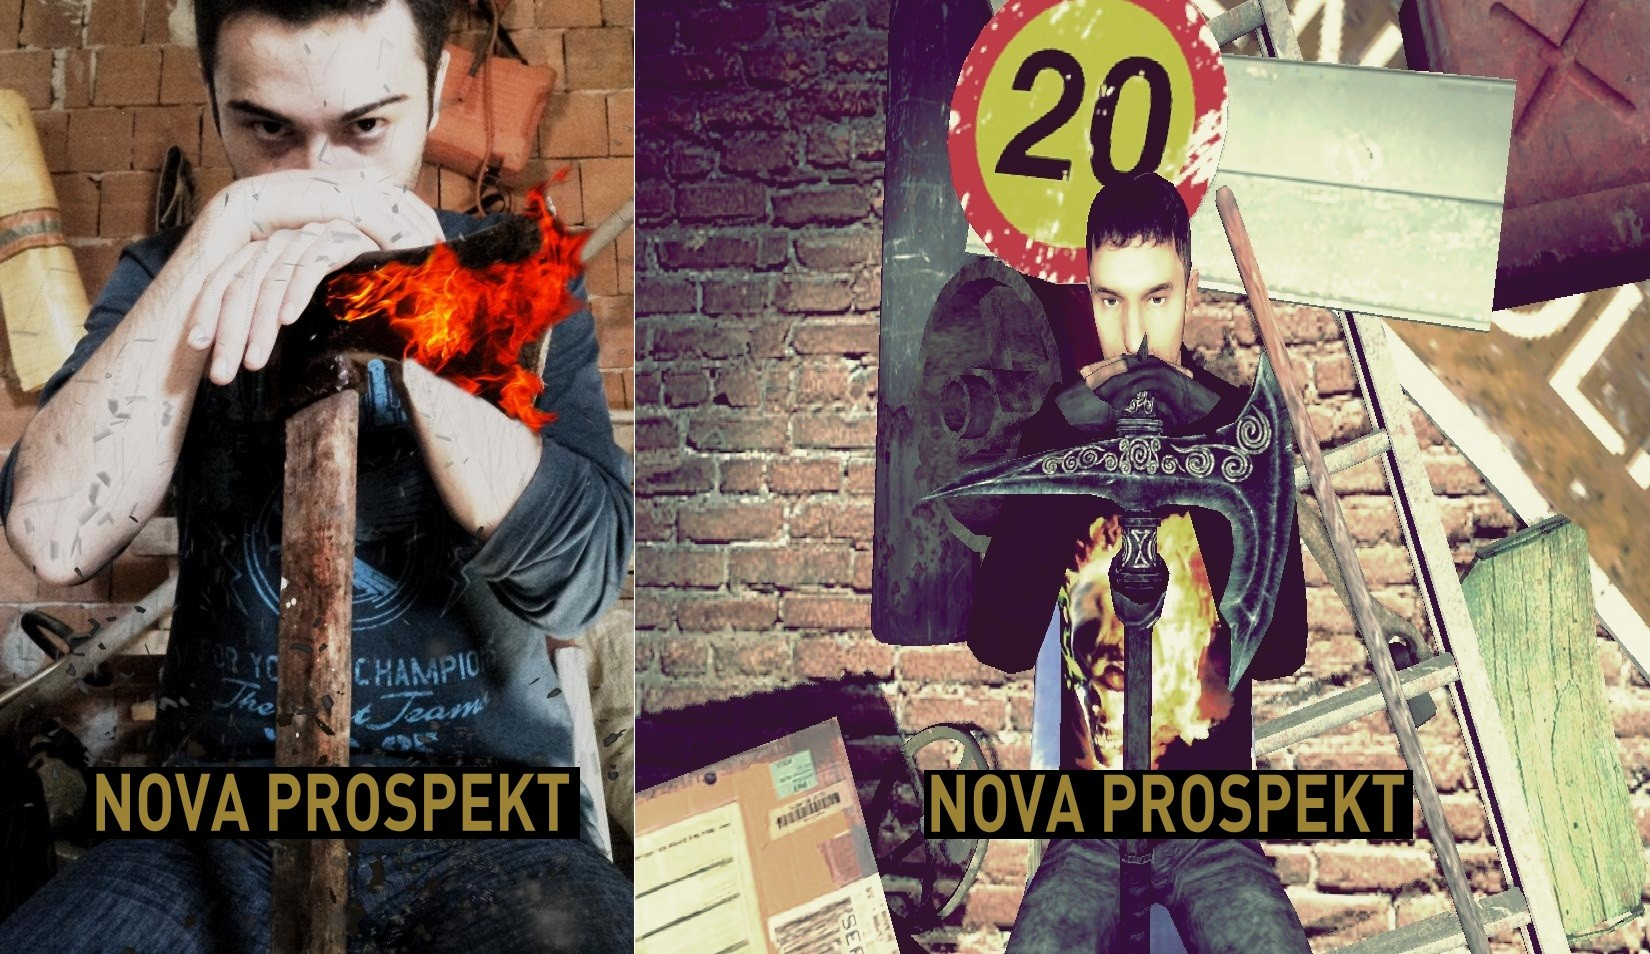 Nova Prospekt'ten bir mesaj var!